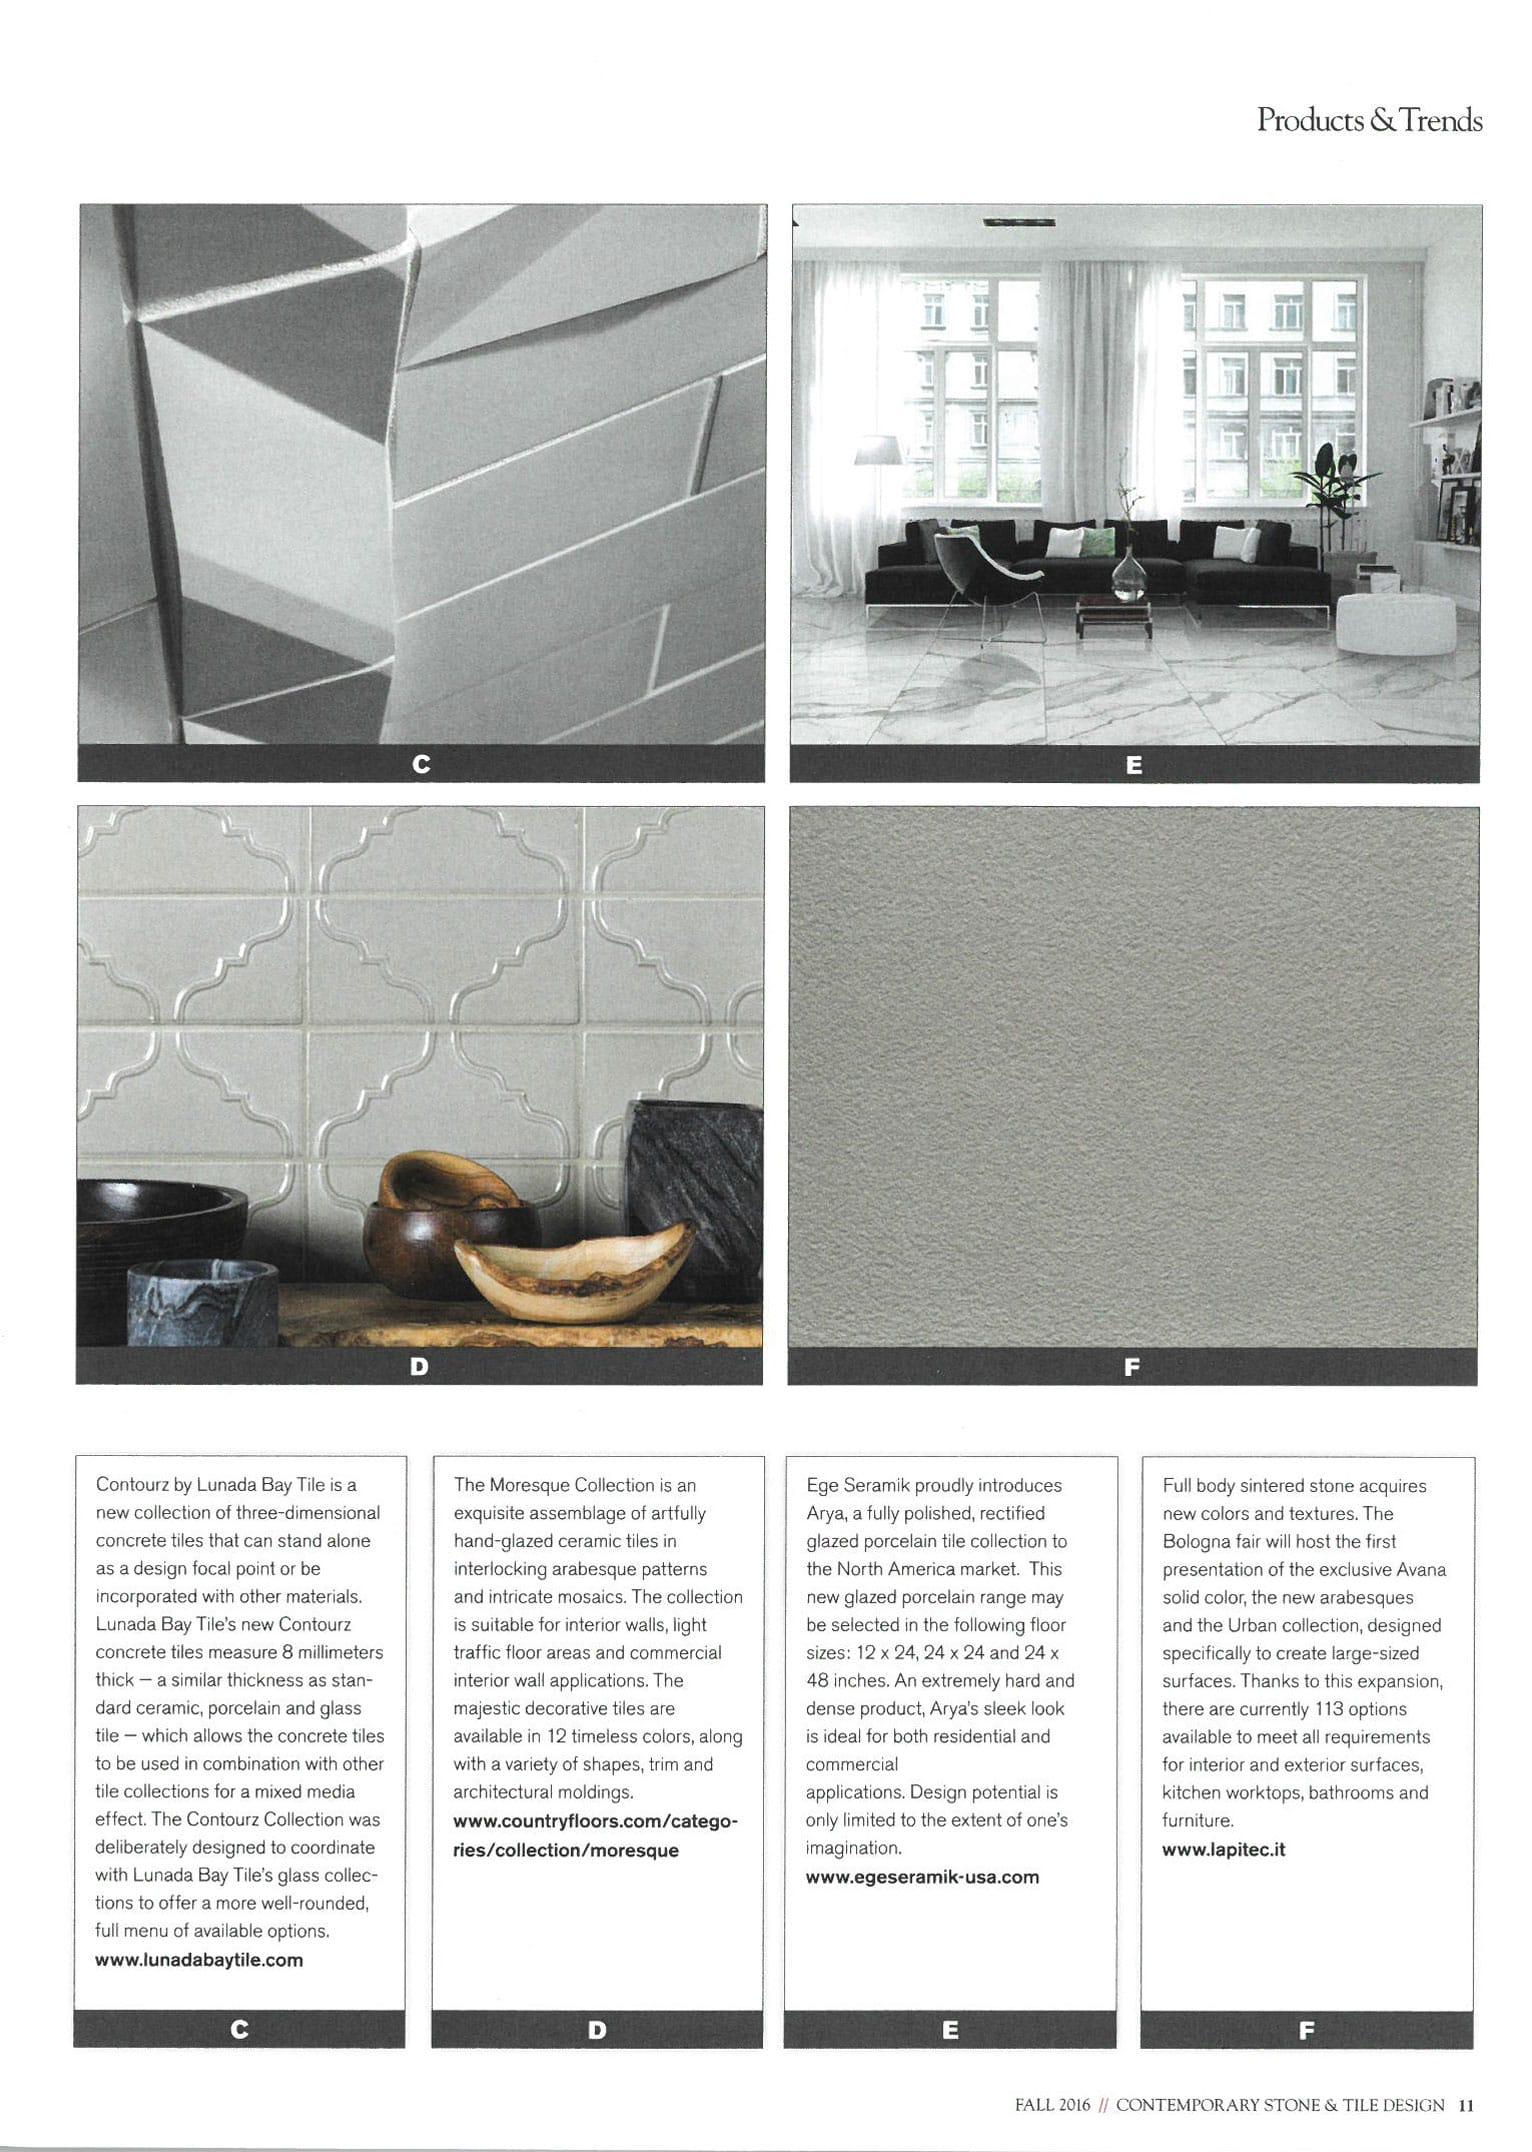 Contemporary Stone & Tile Magazine.